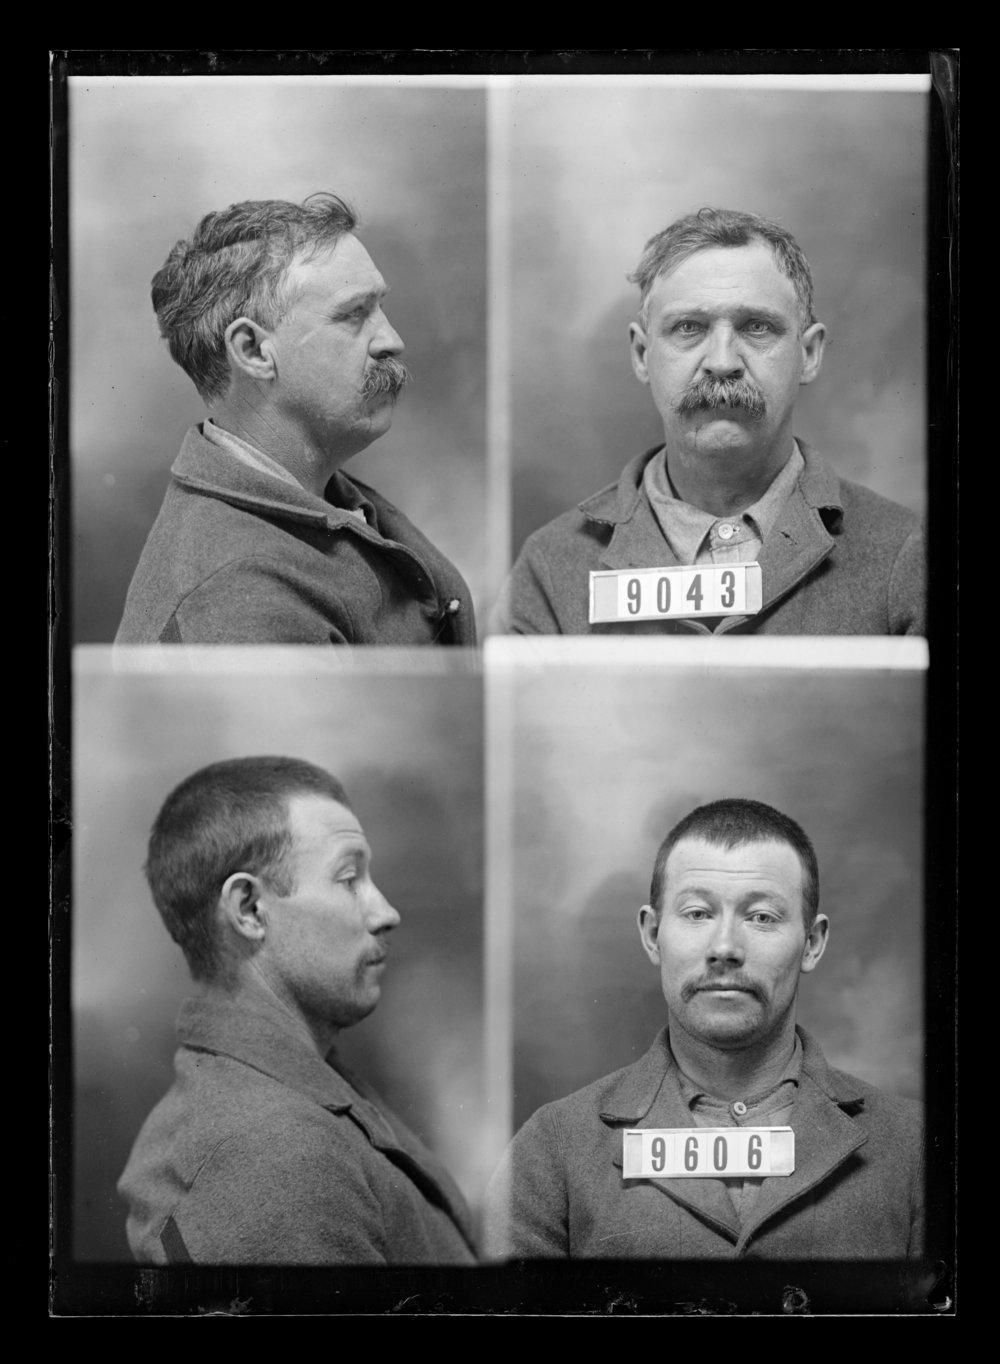 James Pabst and Steve Elliott, prisoners 9606 and 9043